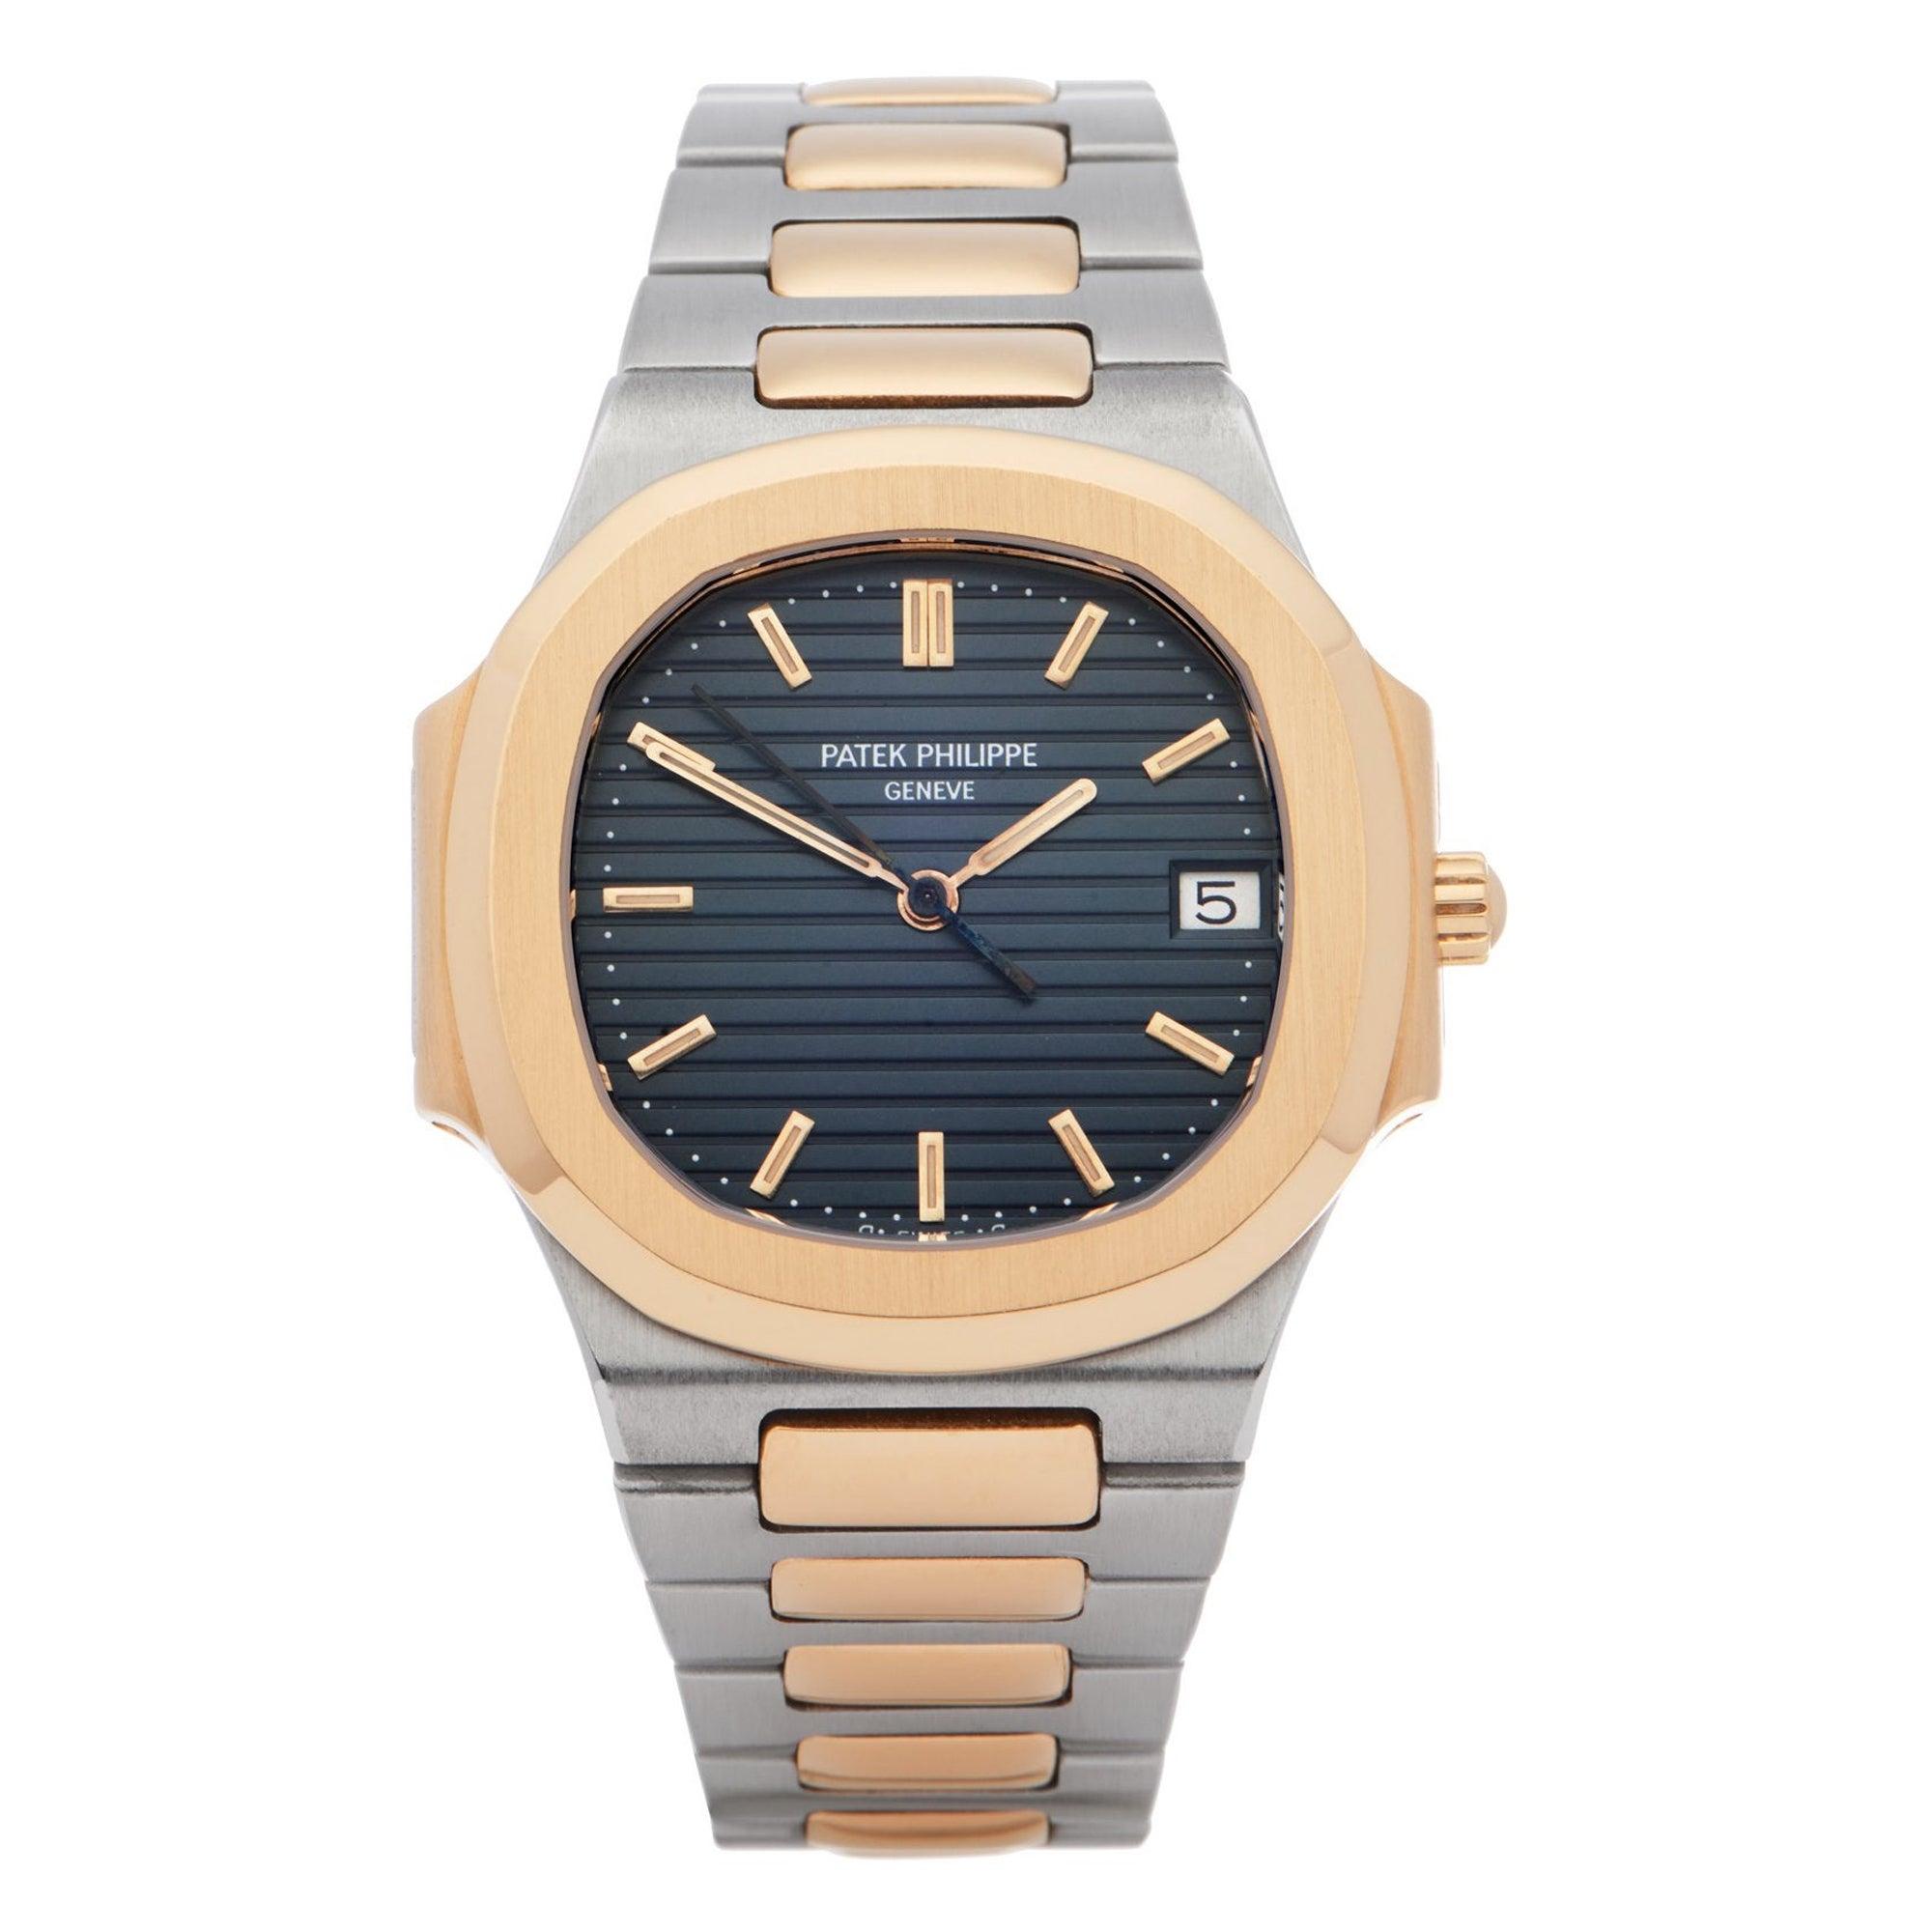 Patek Philippe Nautilus 0 3900 Ladies Yellow Gold & Stainless Steel 0 Watch